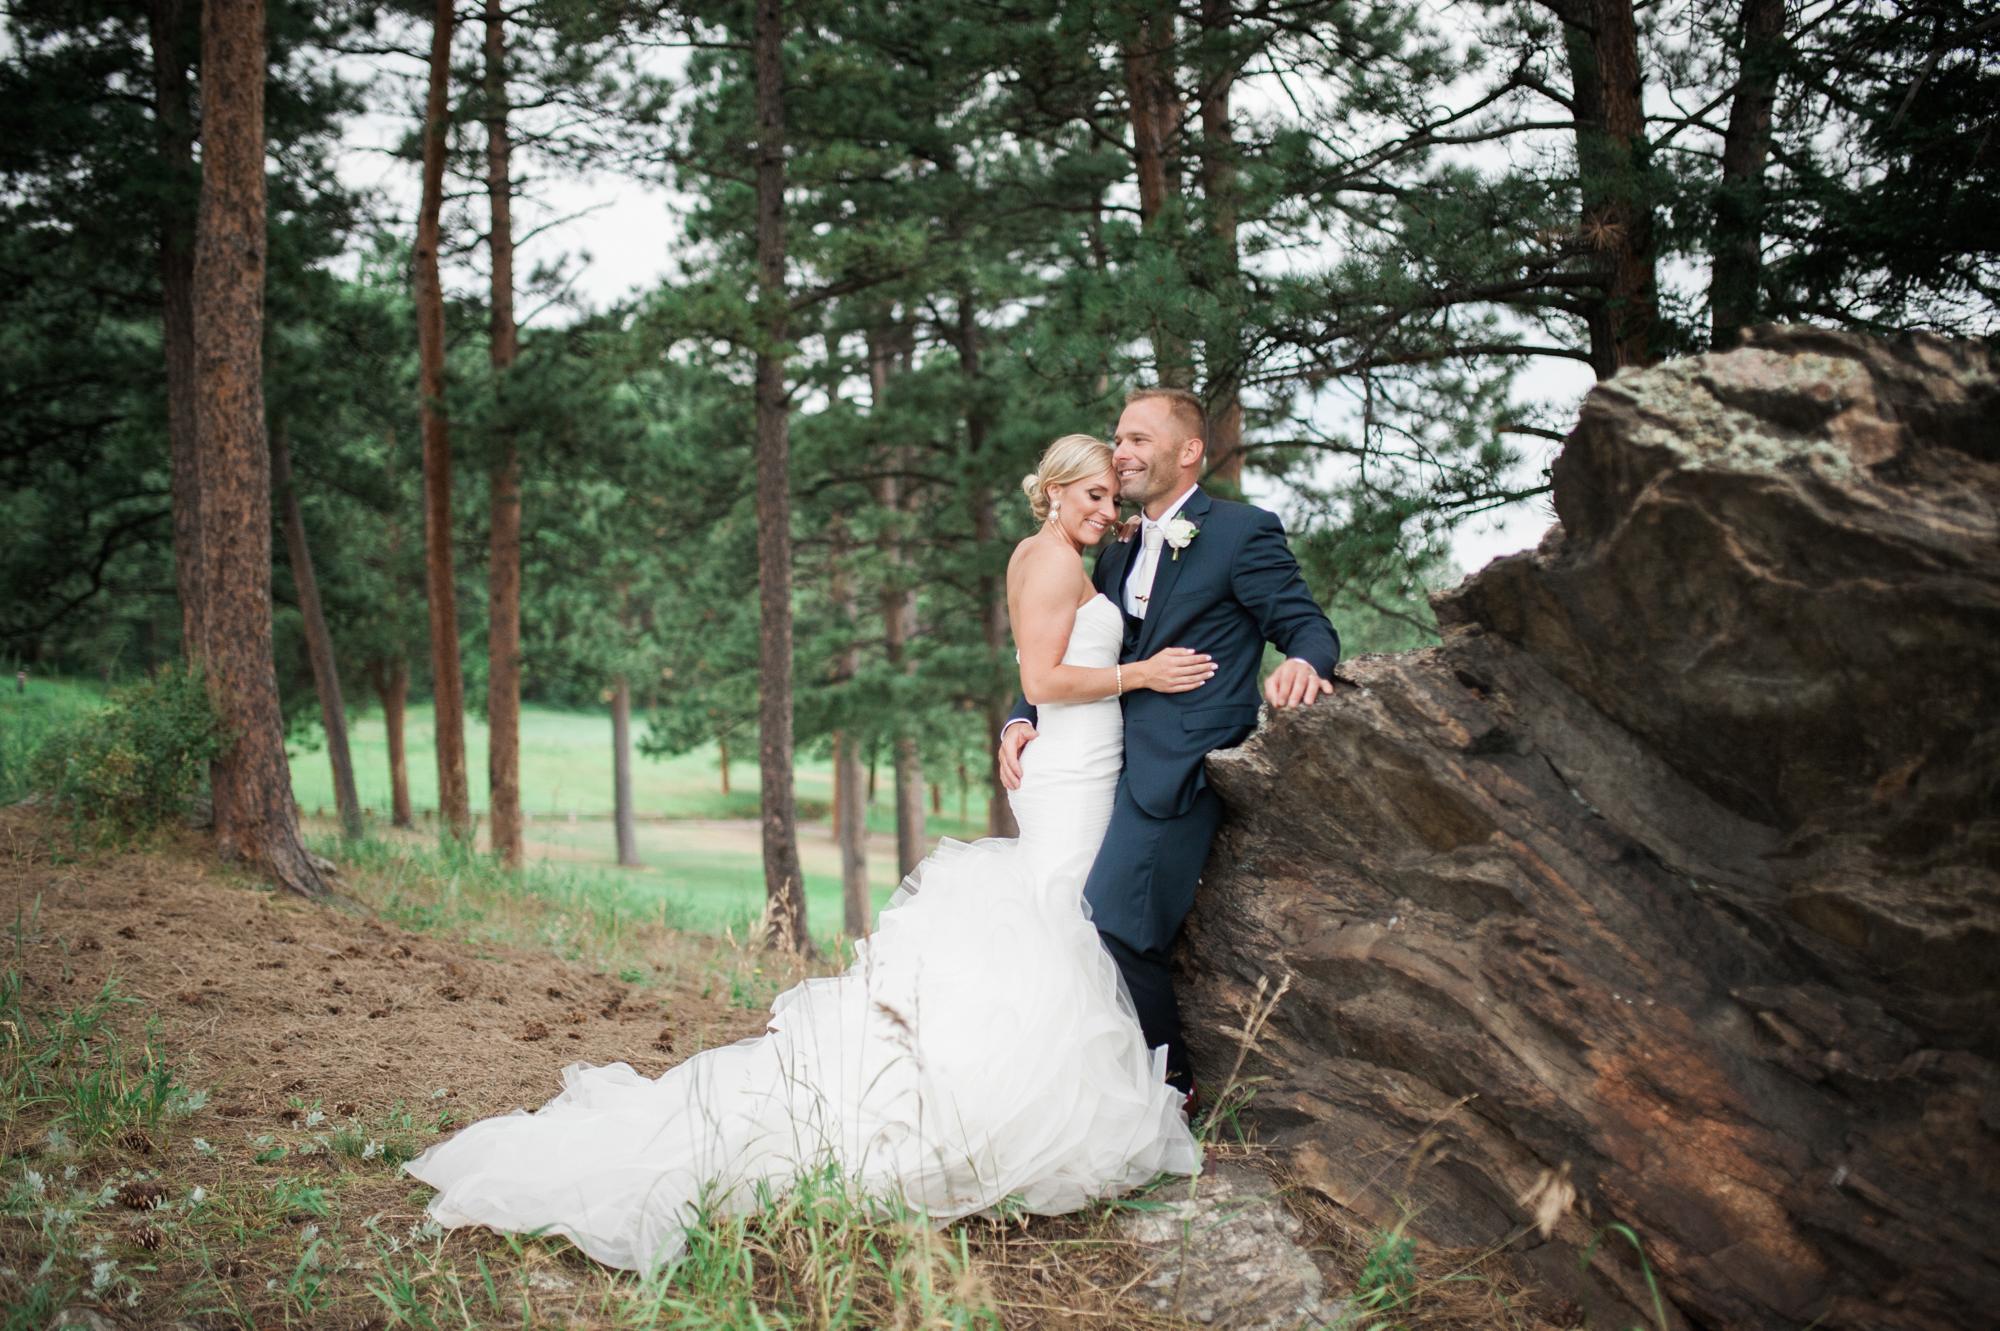 67e86aafd94e iowa-city-wedding-photographer-stephanie-marie-photography -evergreen-colorado-6